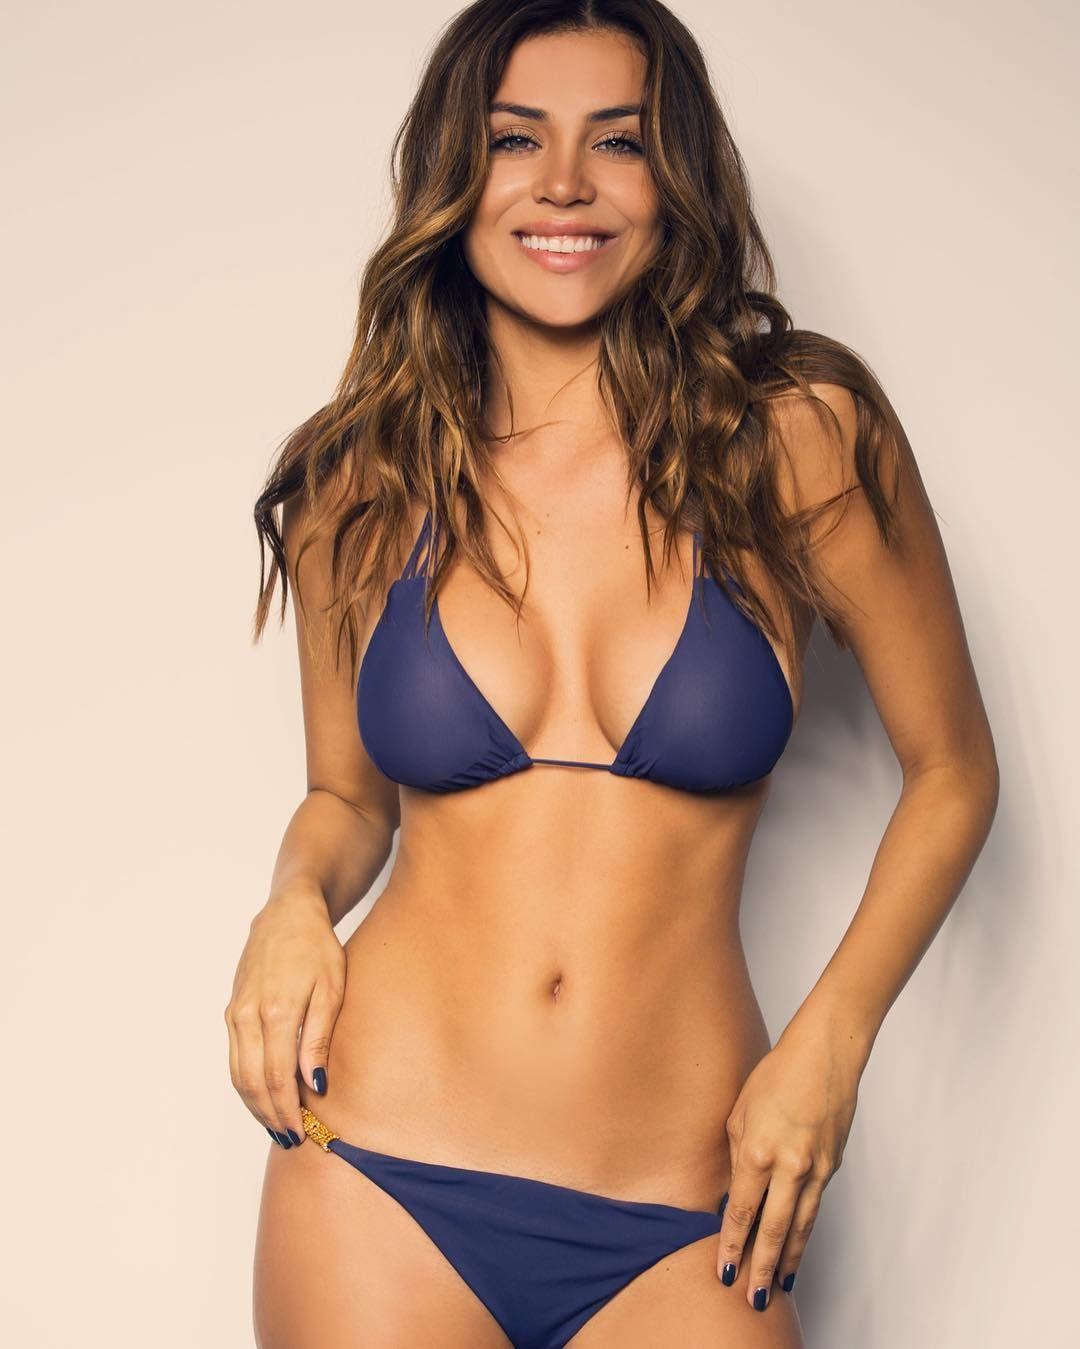 e5b8365e6ef78 Busty Andrea Veira in a blue bikini. Hottest bikini babes. Sexy women in  bikinis